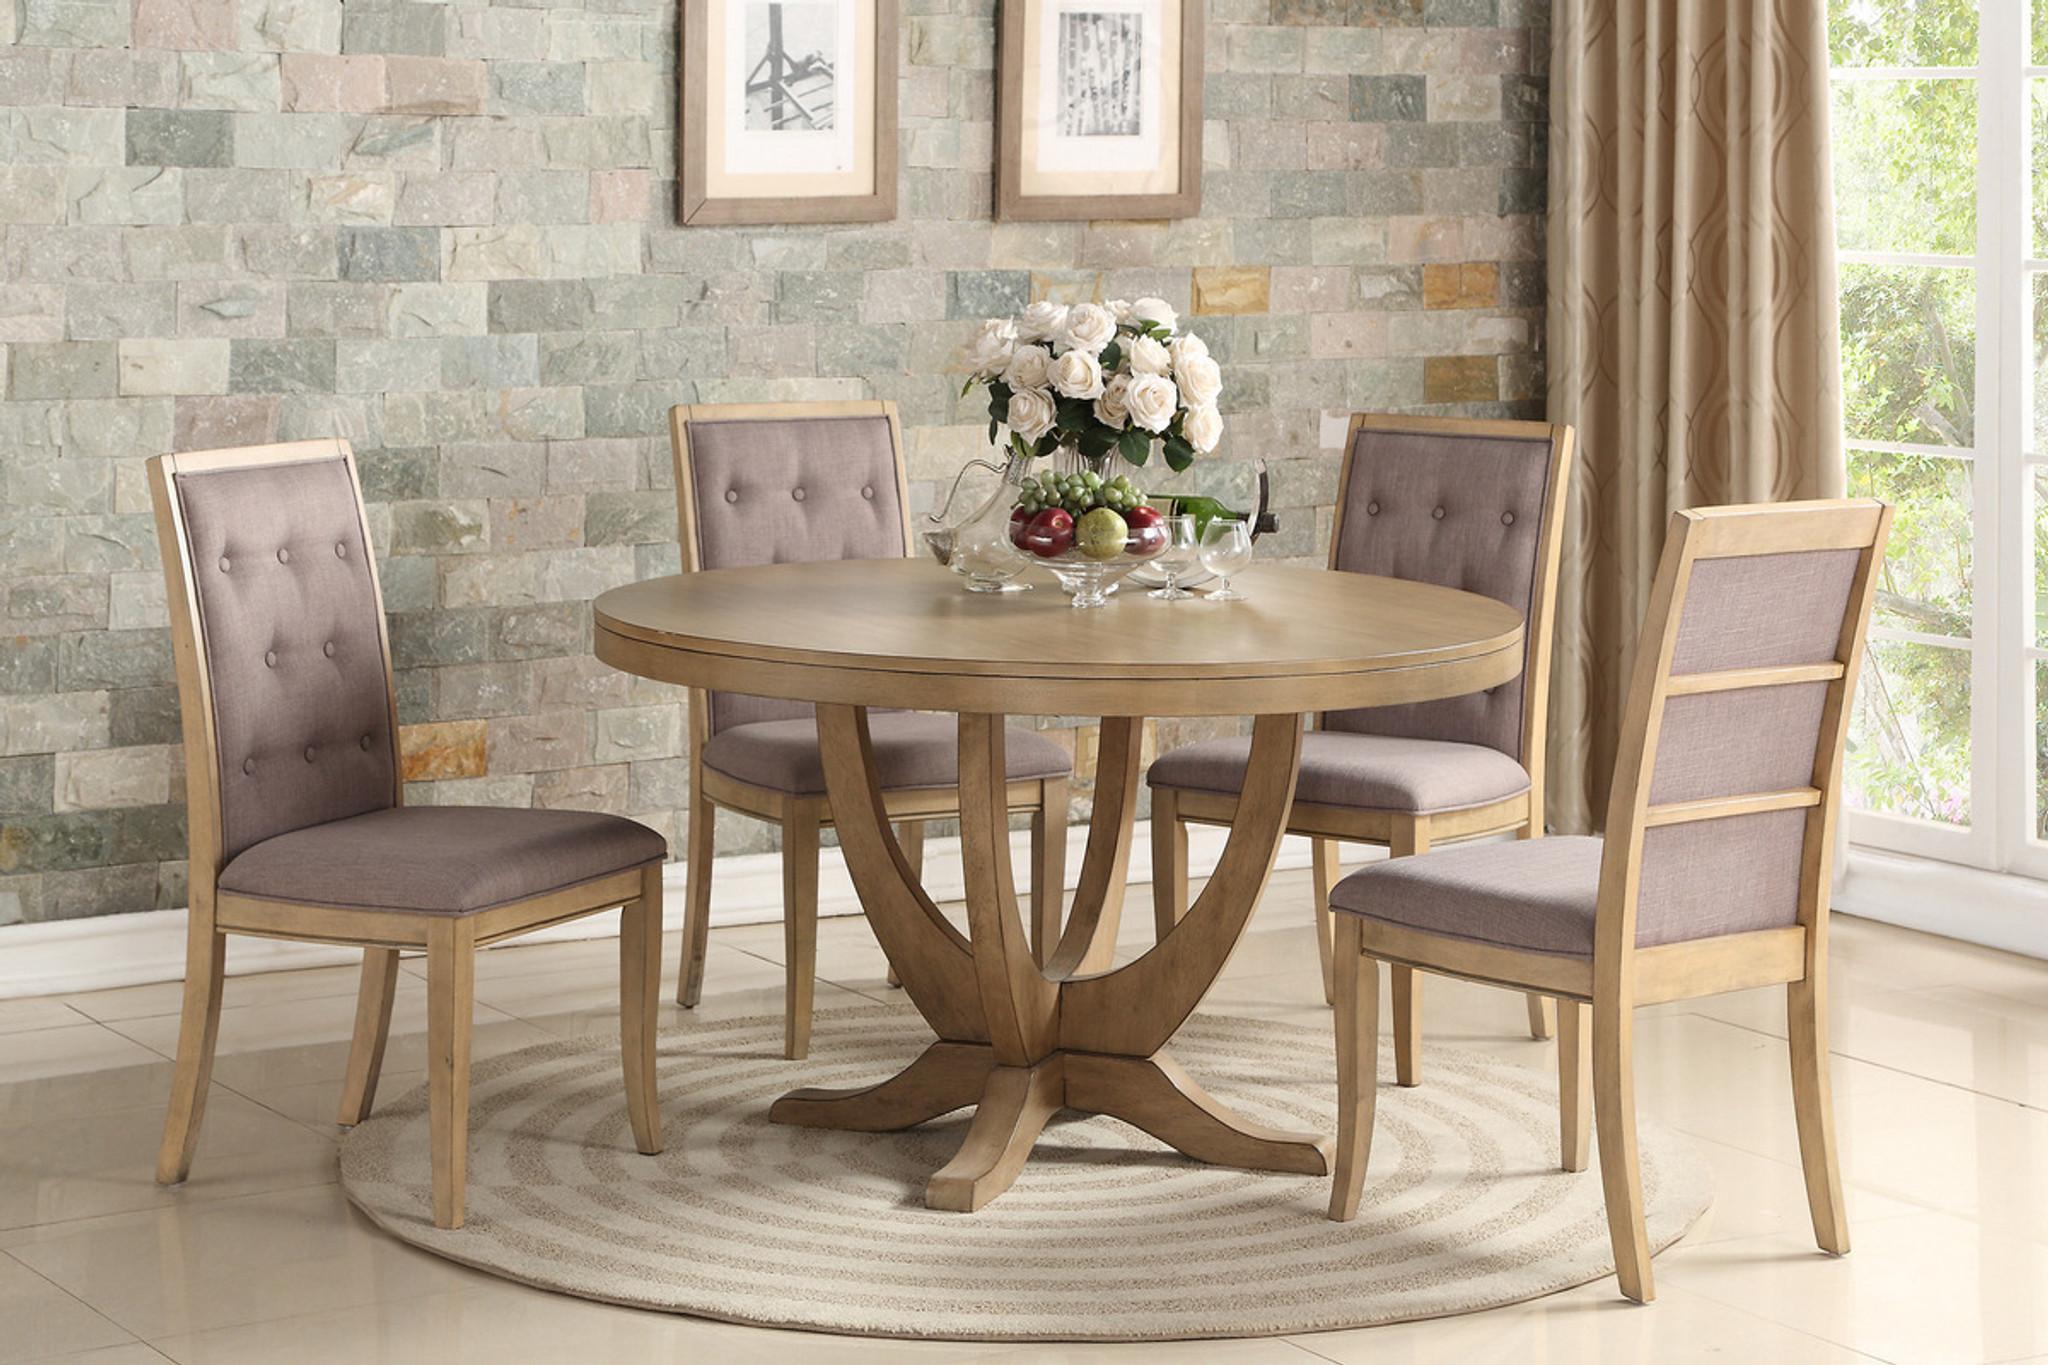 9PCS NATURAL WOOD ROUND DINING TABLE SET